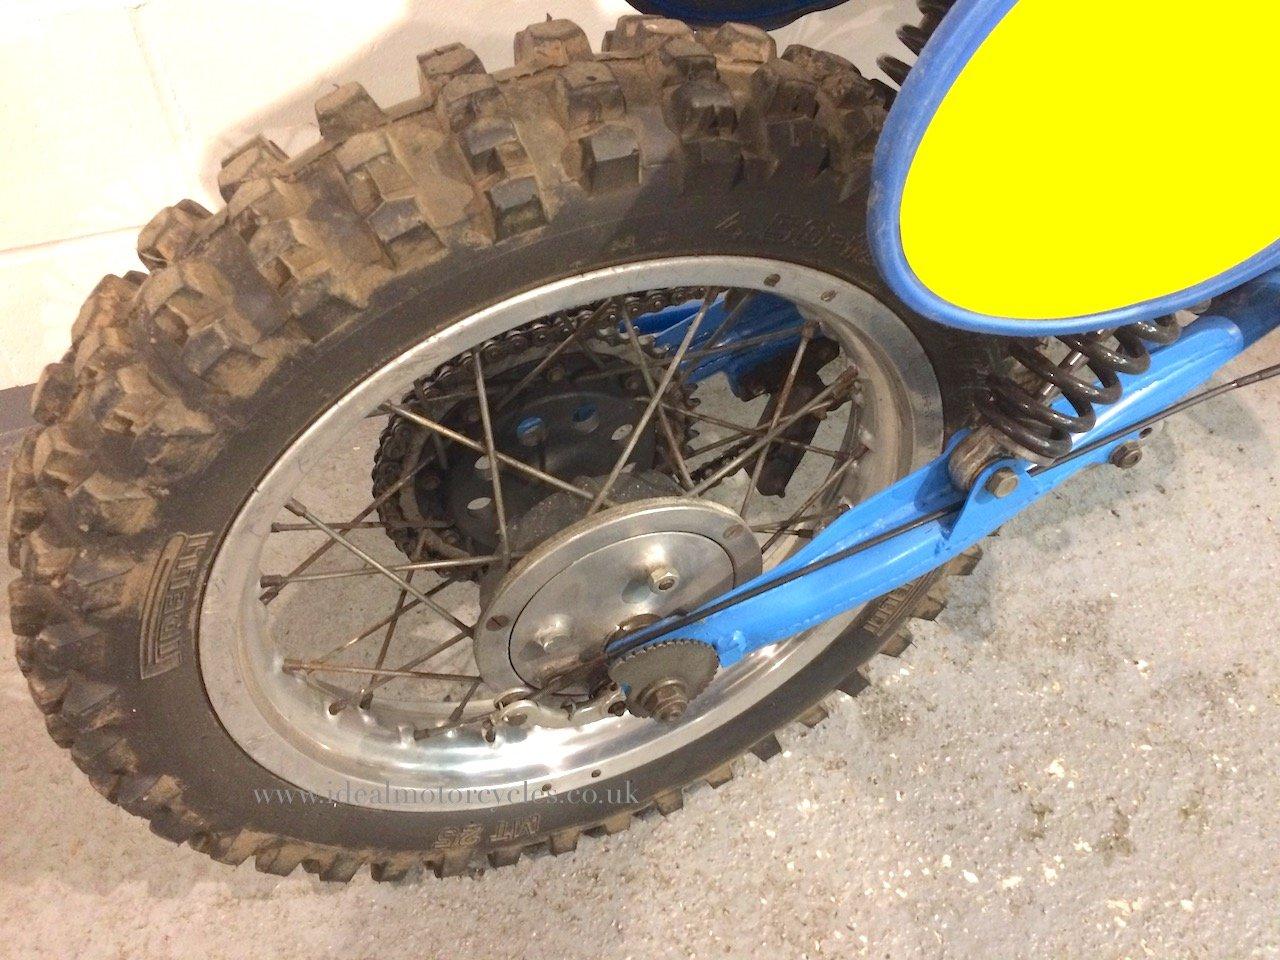 1981 Bultaco Pursang Mk12TT For Sale (picture 3 of 7)